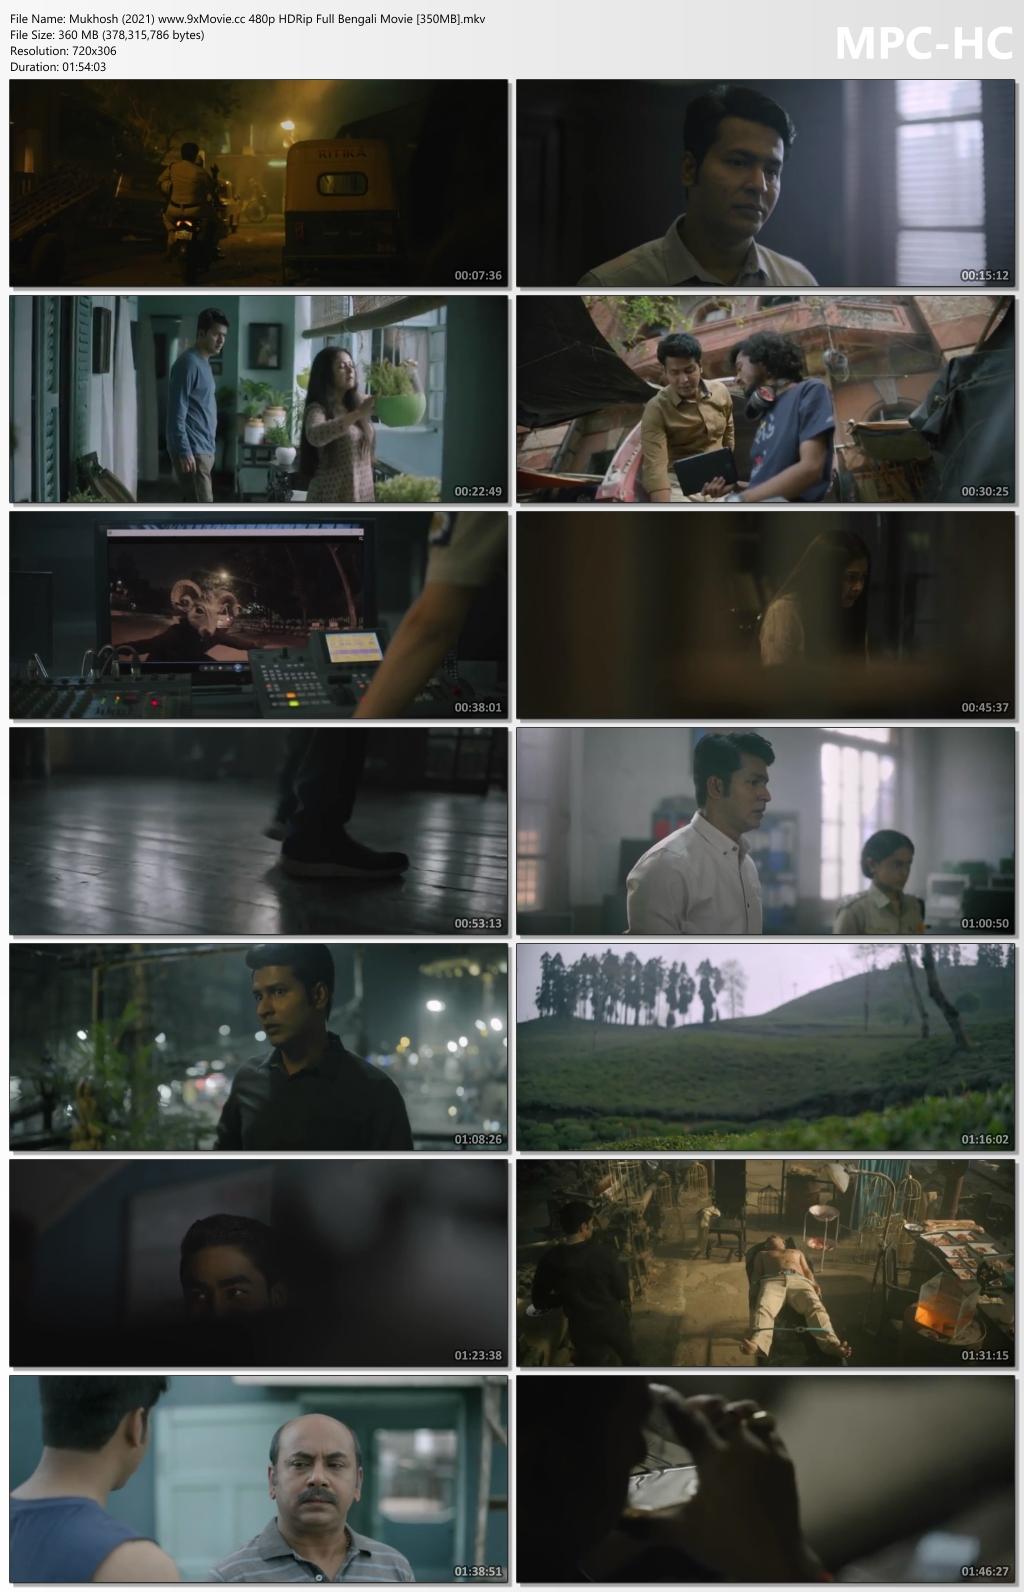 Mukhosh-2021-www-9x-Movie-cc-480p-HDRip-Full-Bengali-Movie-350-MB-mkv